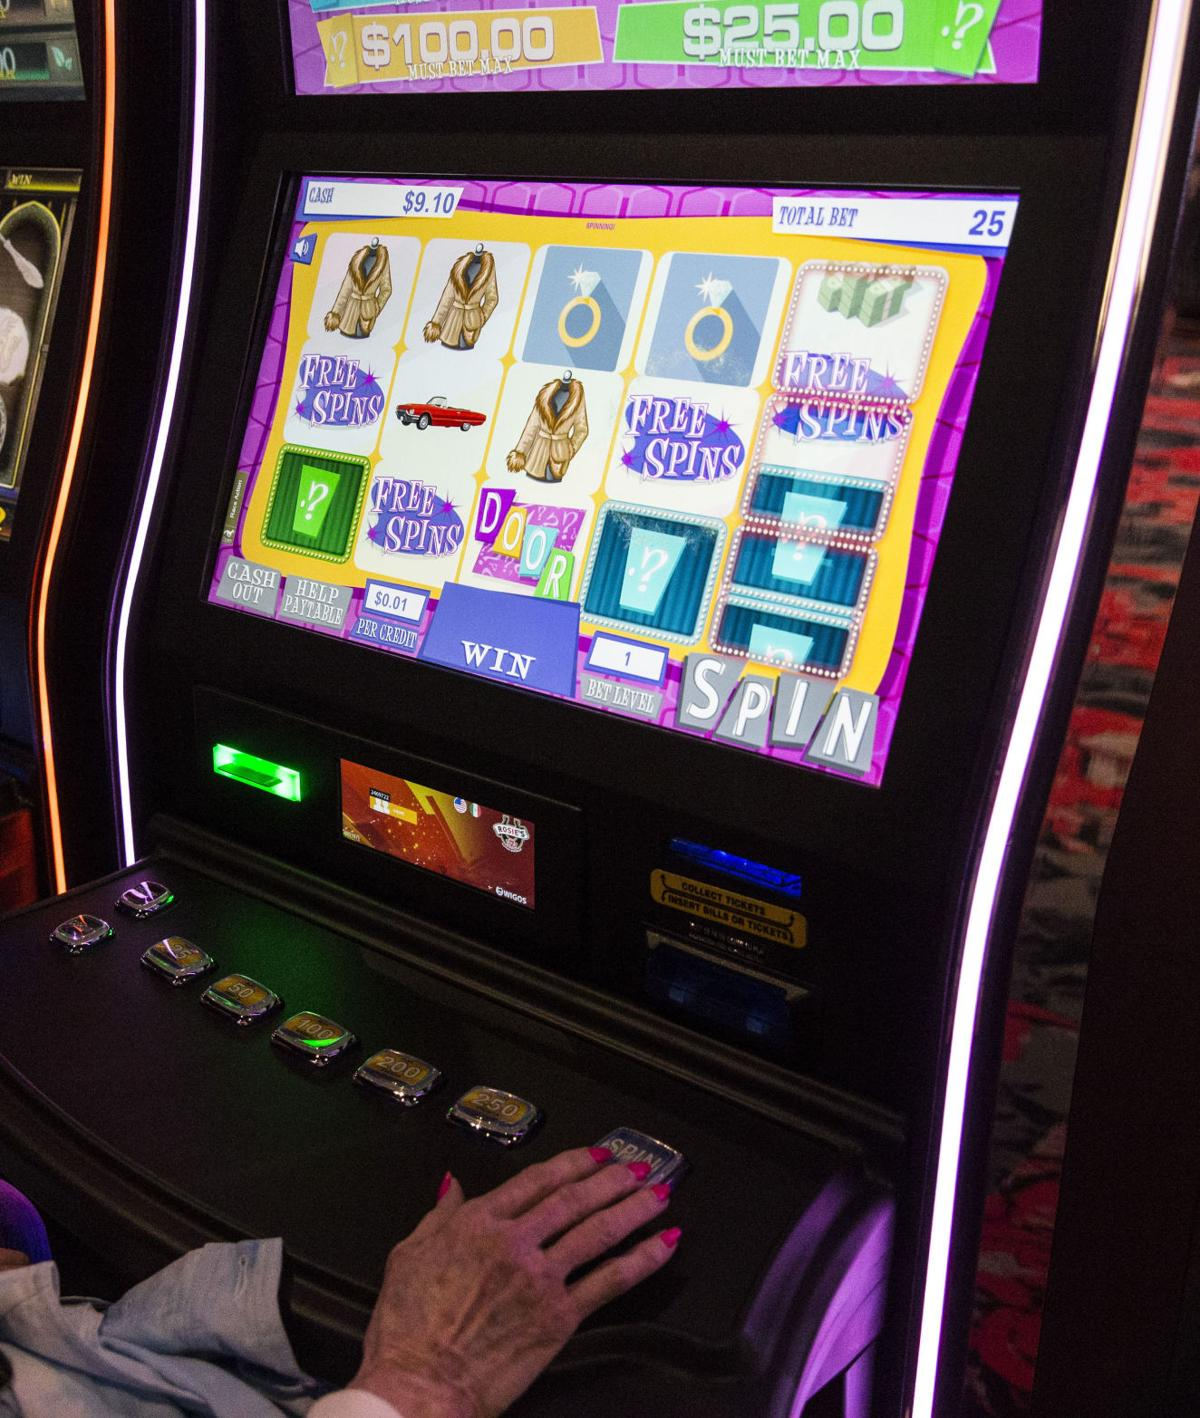 Gossip slots casino review